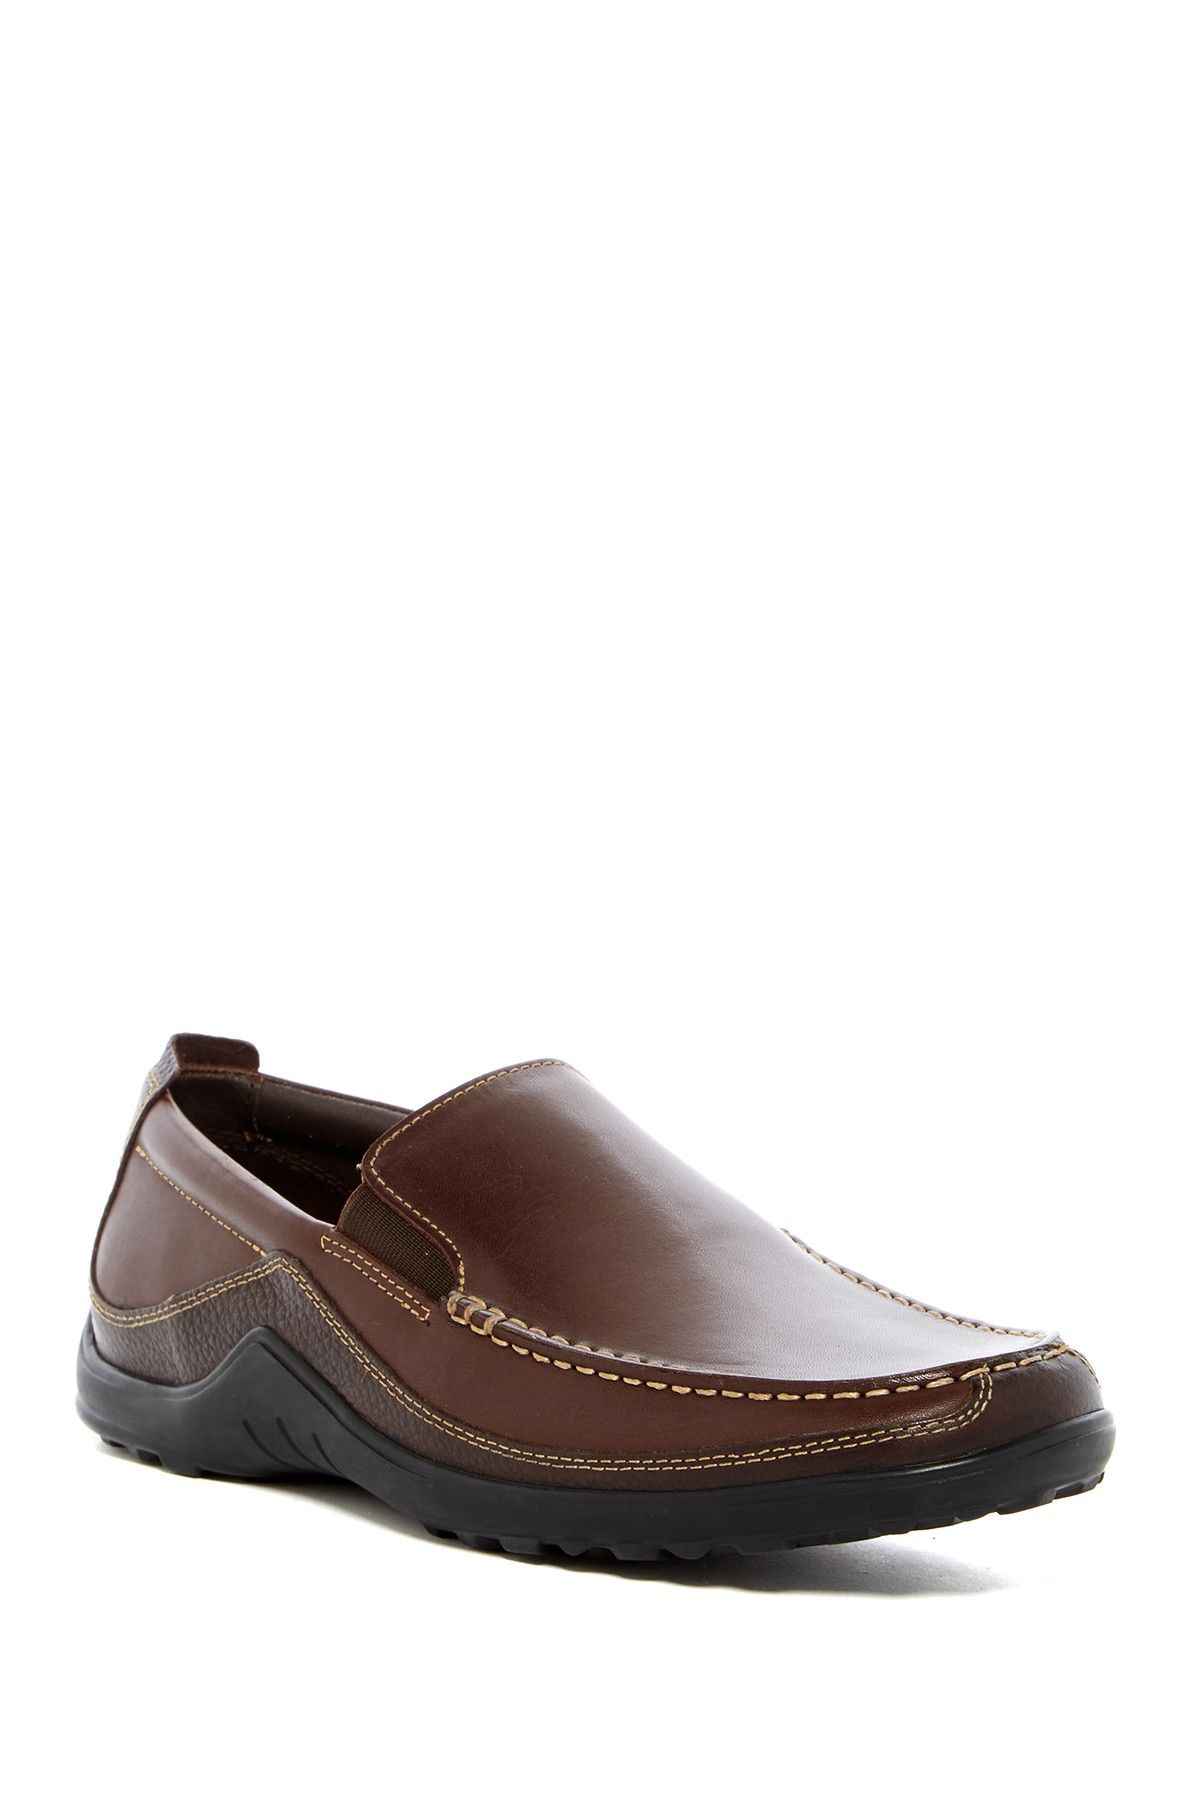 Tucker Venetian Loafer. VenetianLoaferCole HaanNordstrom RackLoafersPenny  LoaferBoat Shoes